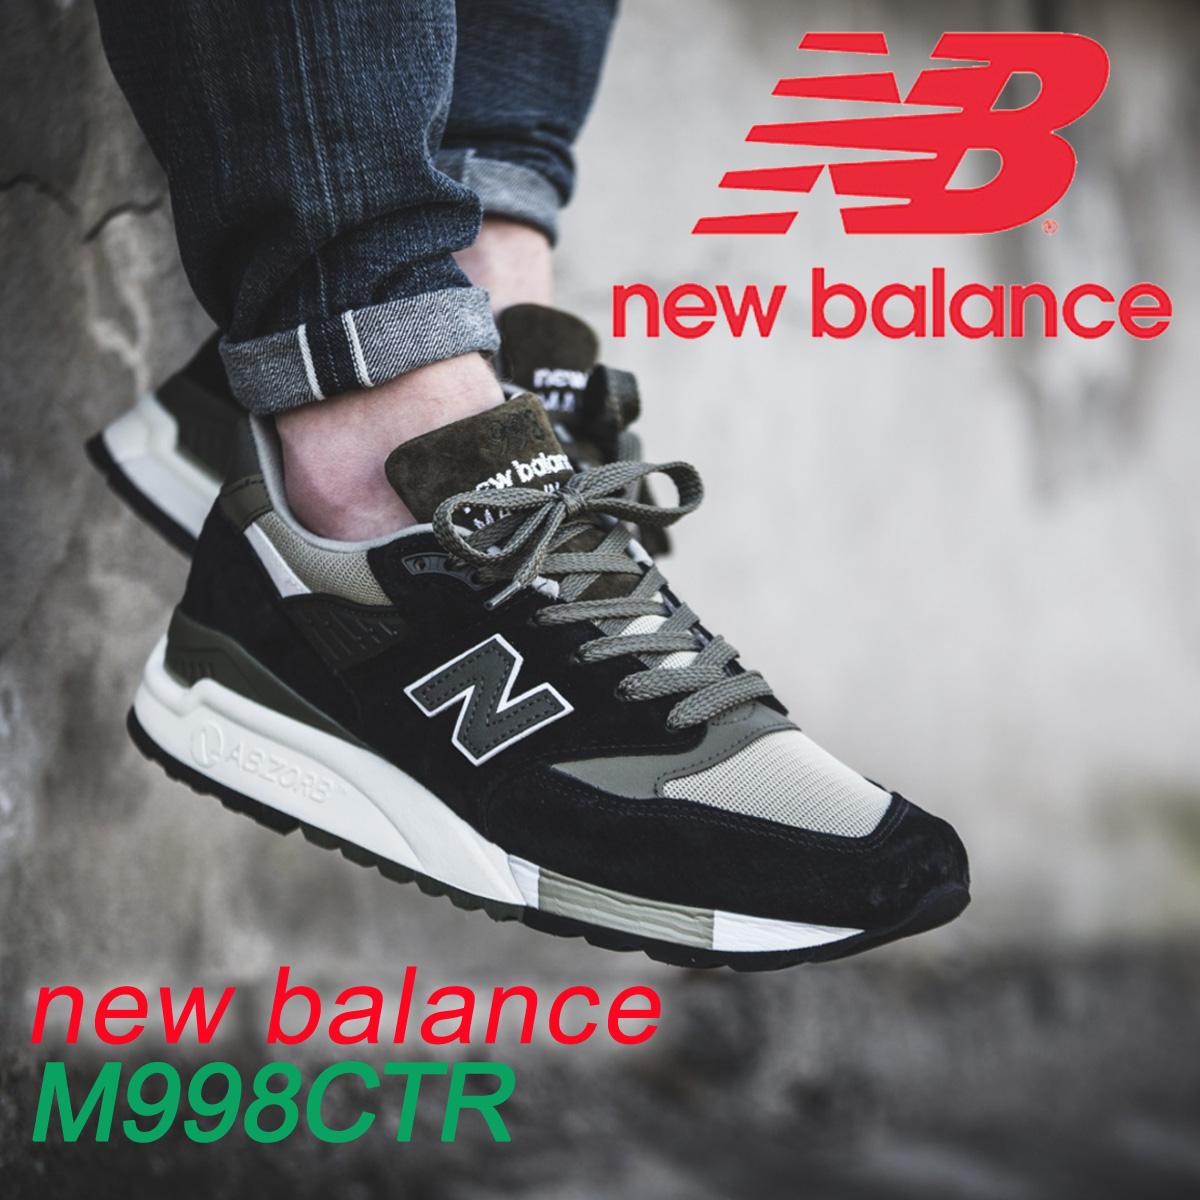 new balance 998 olive